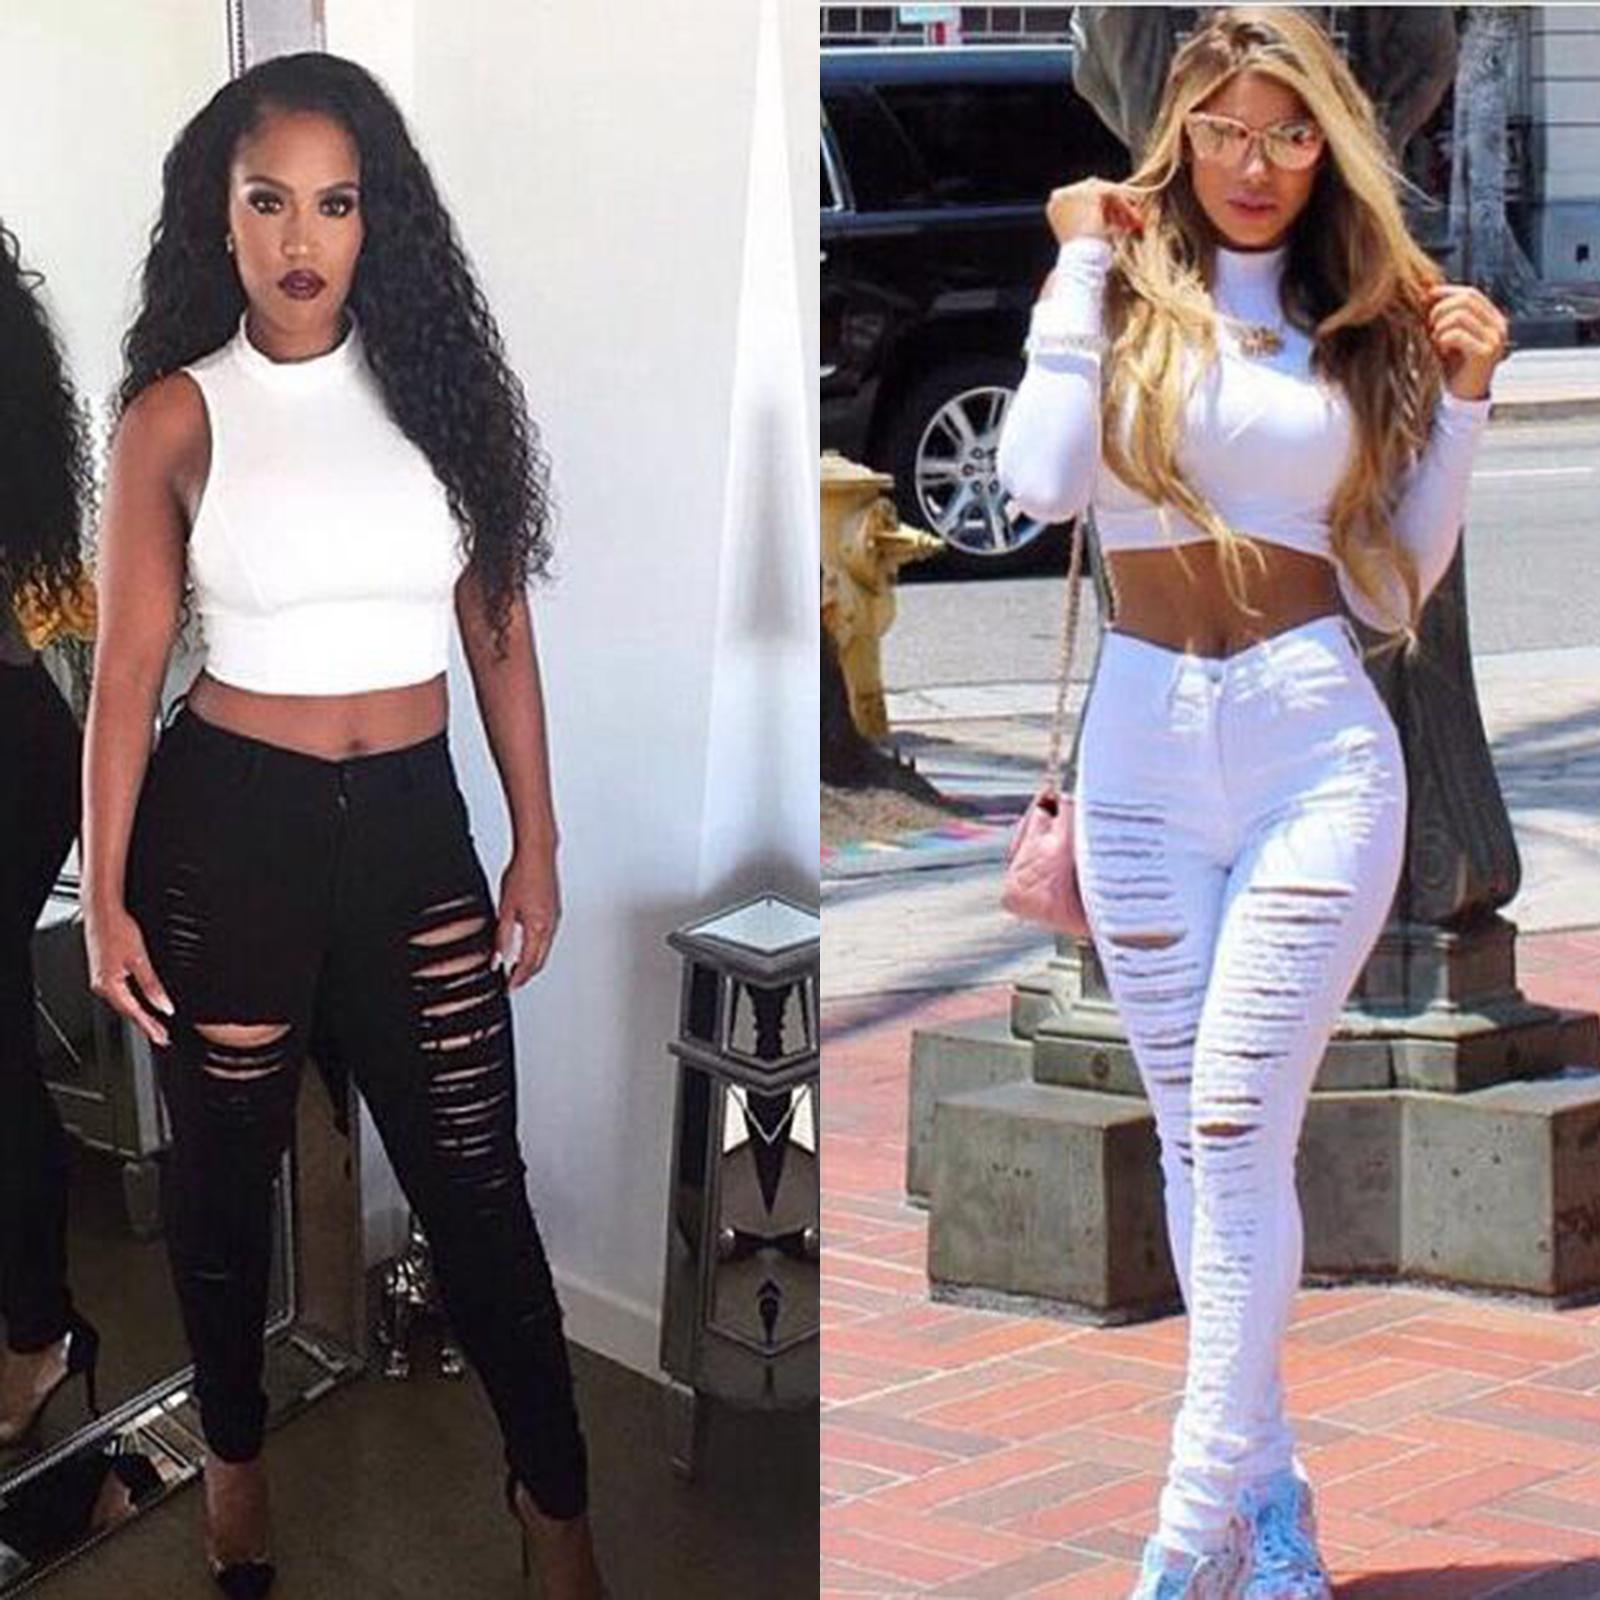 Women Skinny Ripped Holes Jeans Pants High Waist Stretch Slim Pencil Trousers Ebay